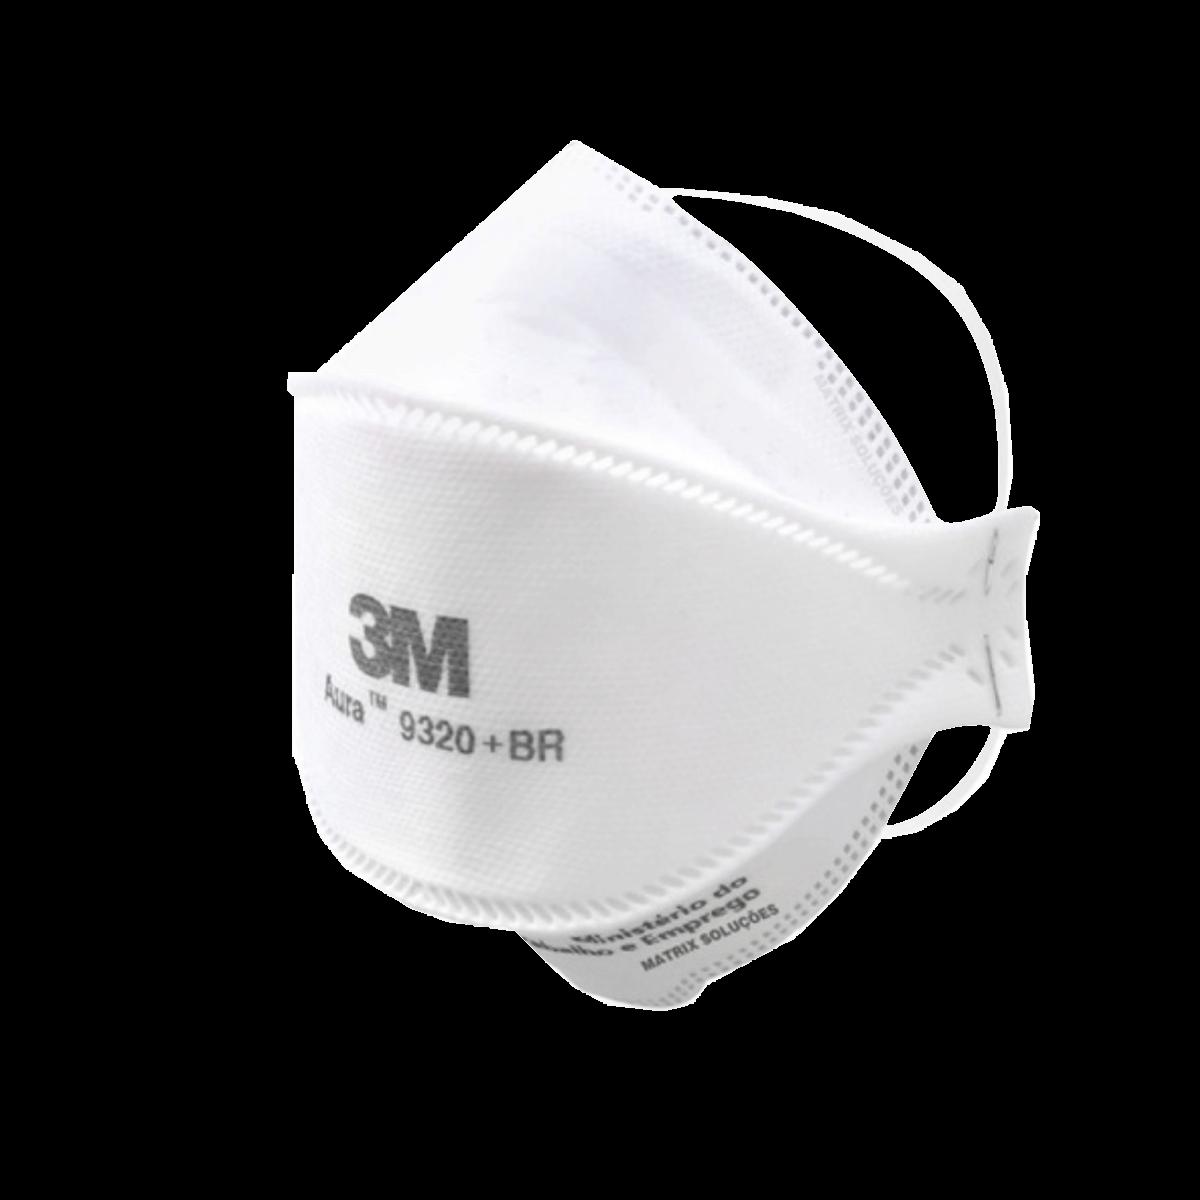 Máscara Proteção Respirador Aura Pff2S 9320 + BR 3M Kit 10 un